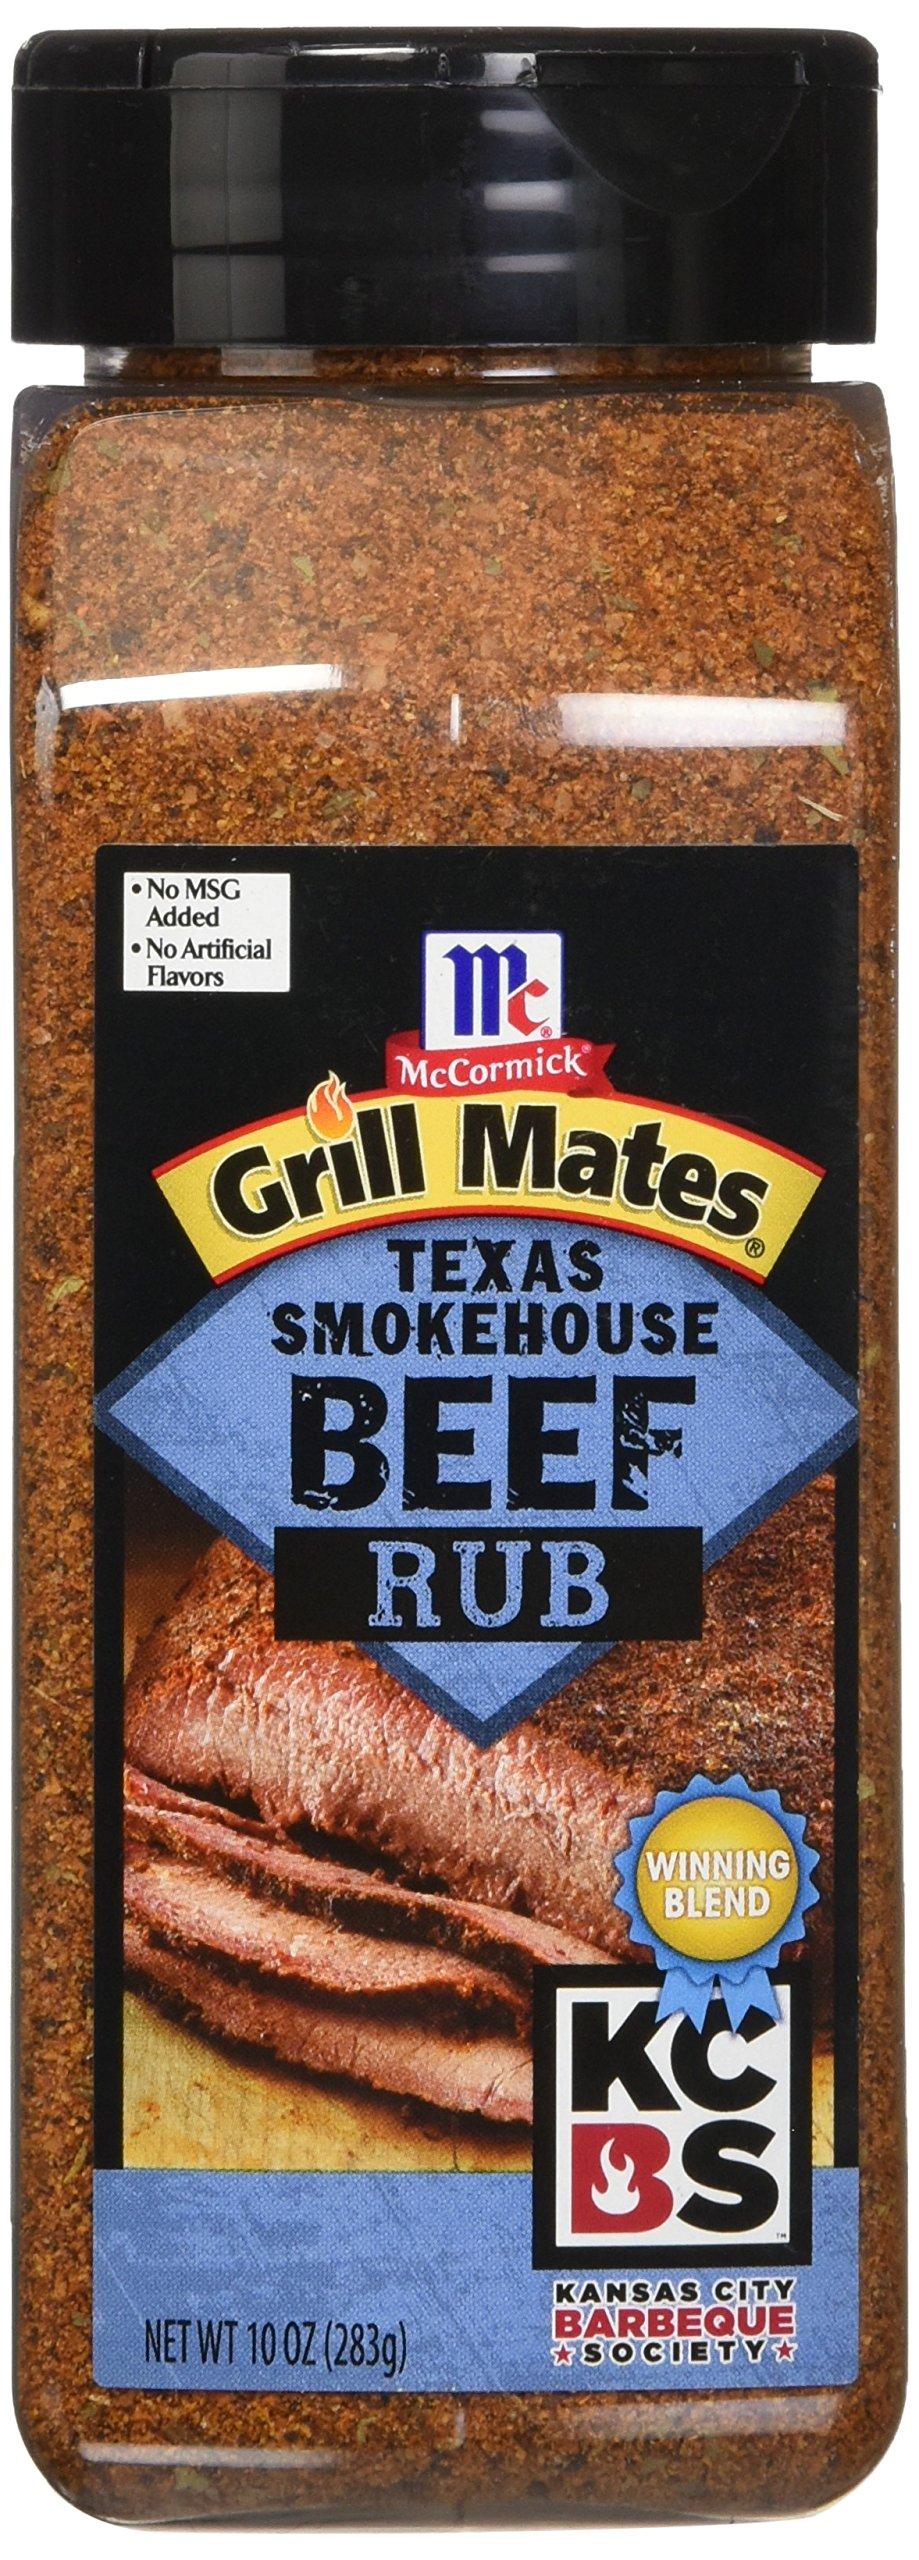 Grill Mates Kansas City Barbeque Society Texas Smoke House Beef Rub, 10 Ounce